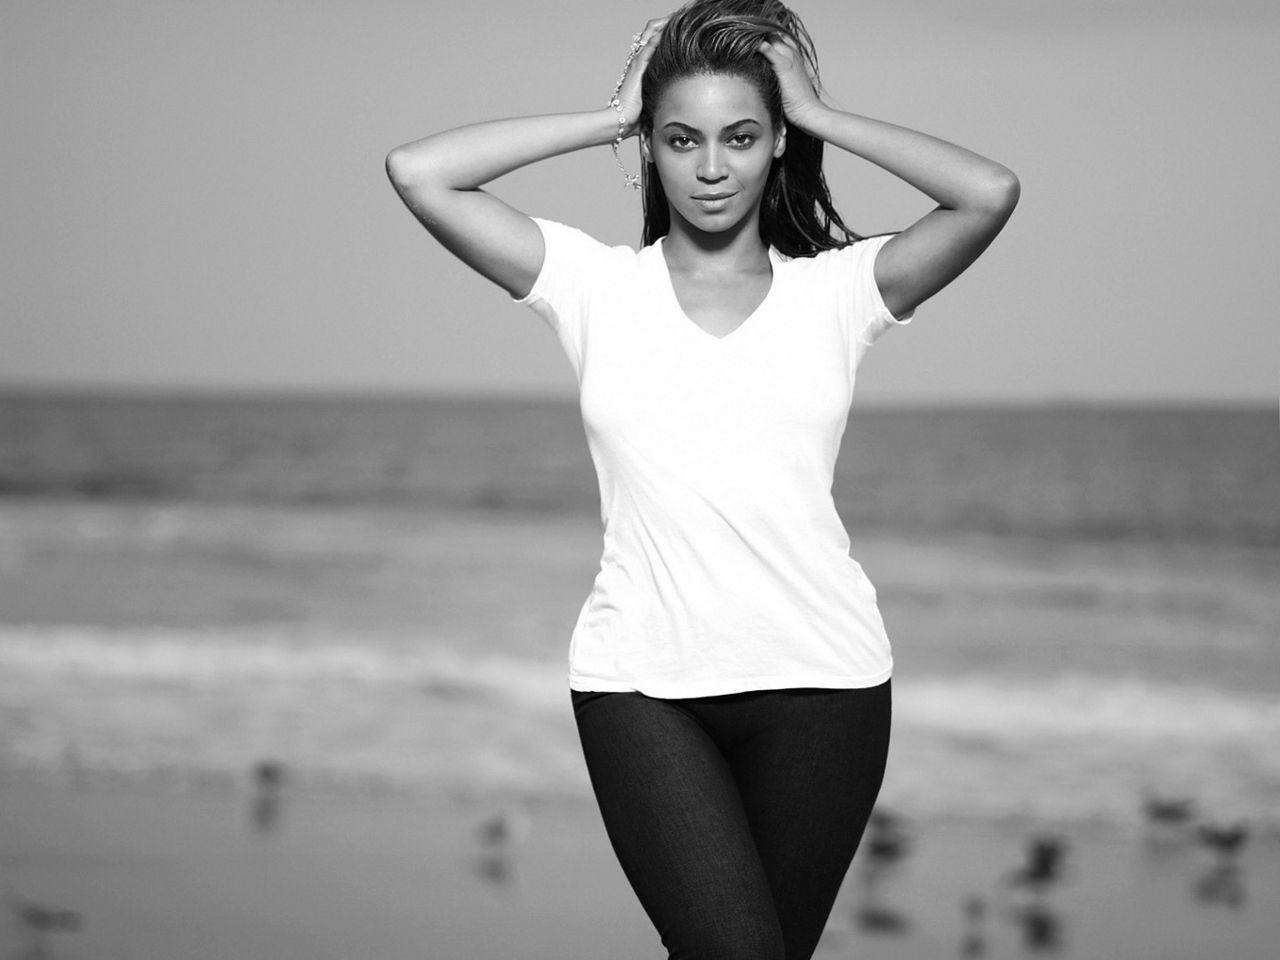 Beyonce IASF beyonce Wallpaper